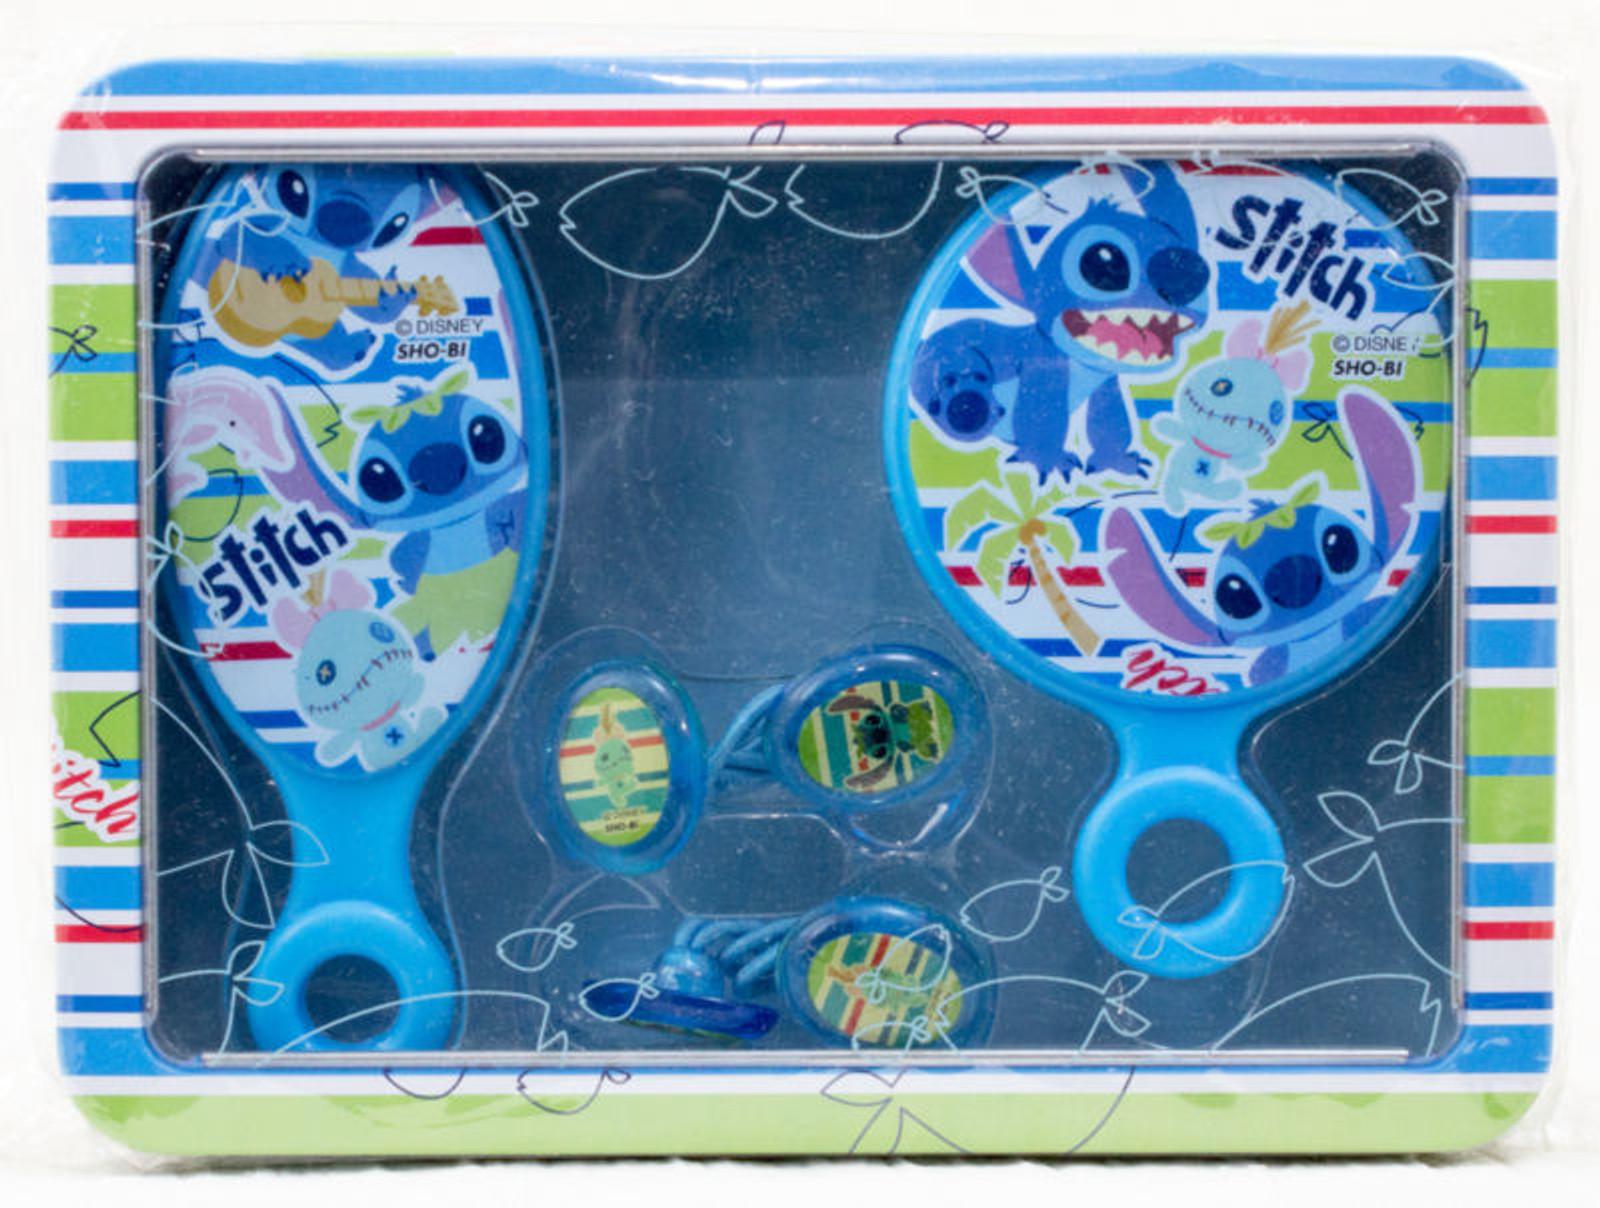 Disney Stitch Toiletries Goods Hairbrush Mirror Hair Elastic Tin Case JAPAN